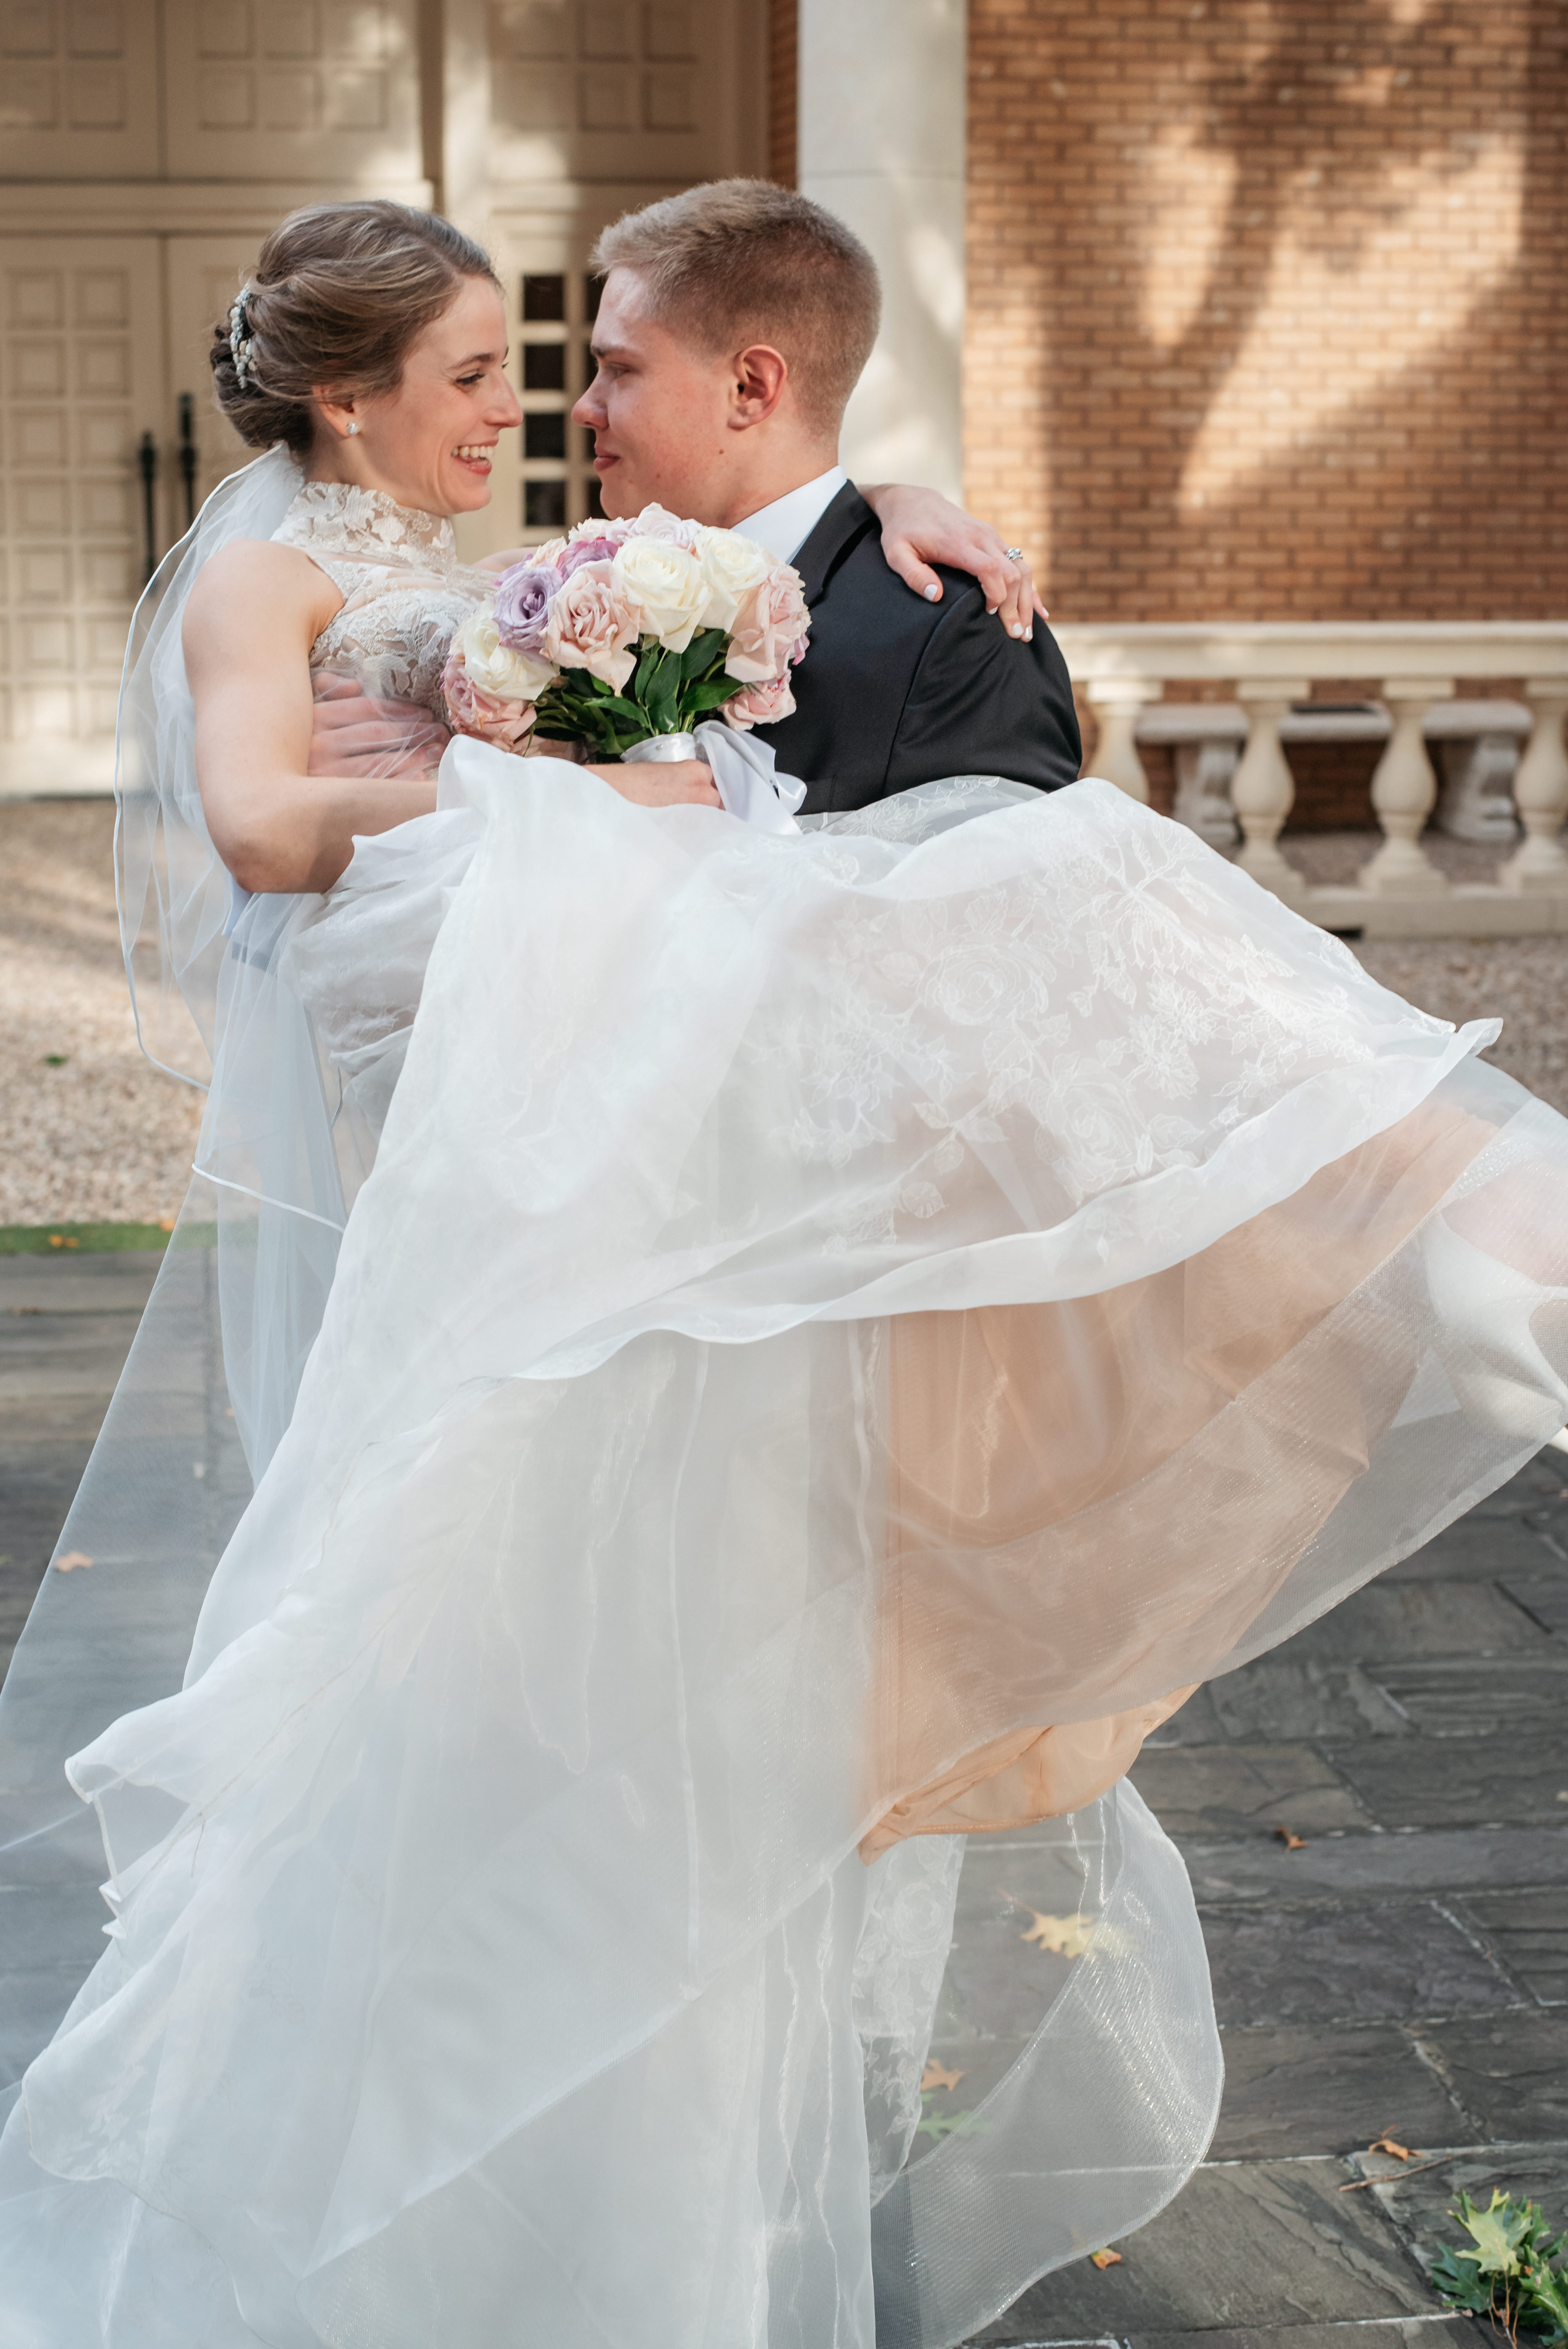 837-G&A-wedding-DSC_4617